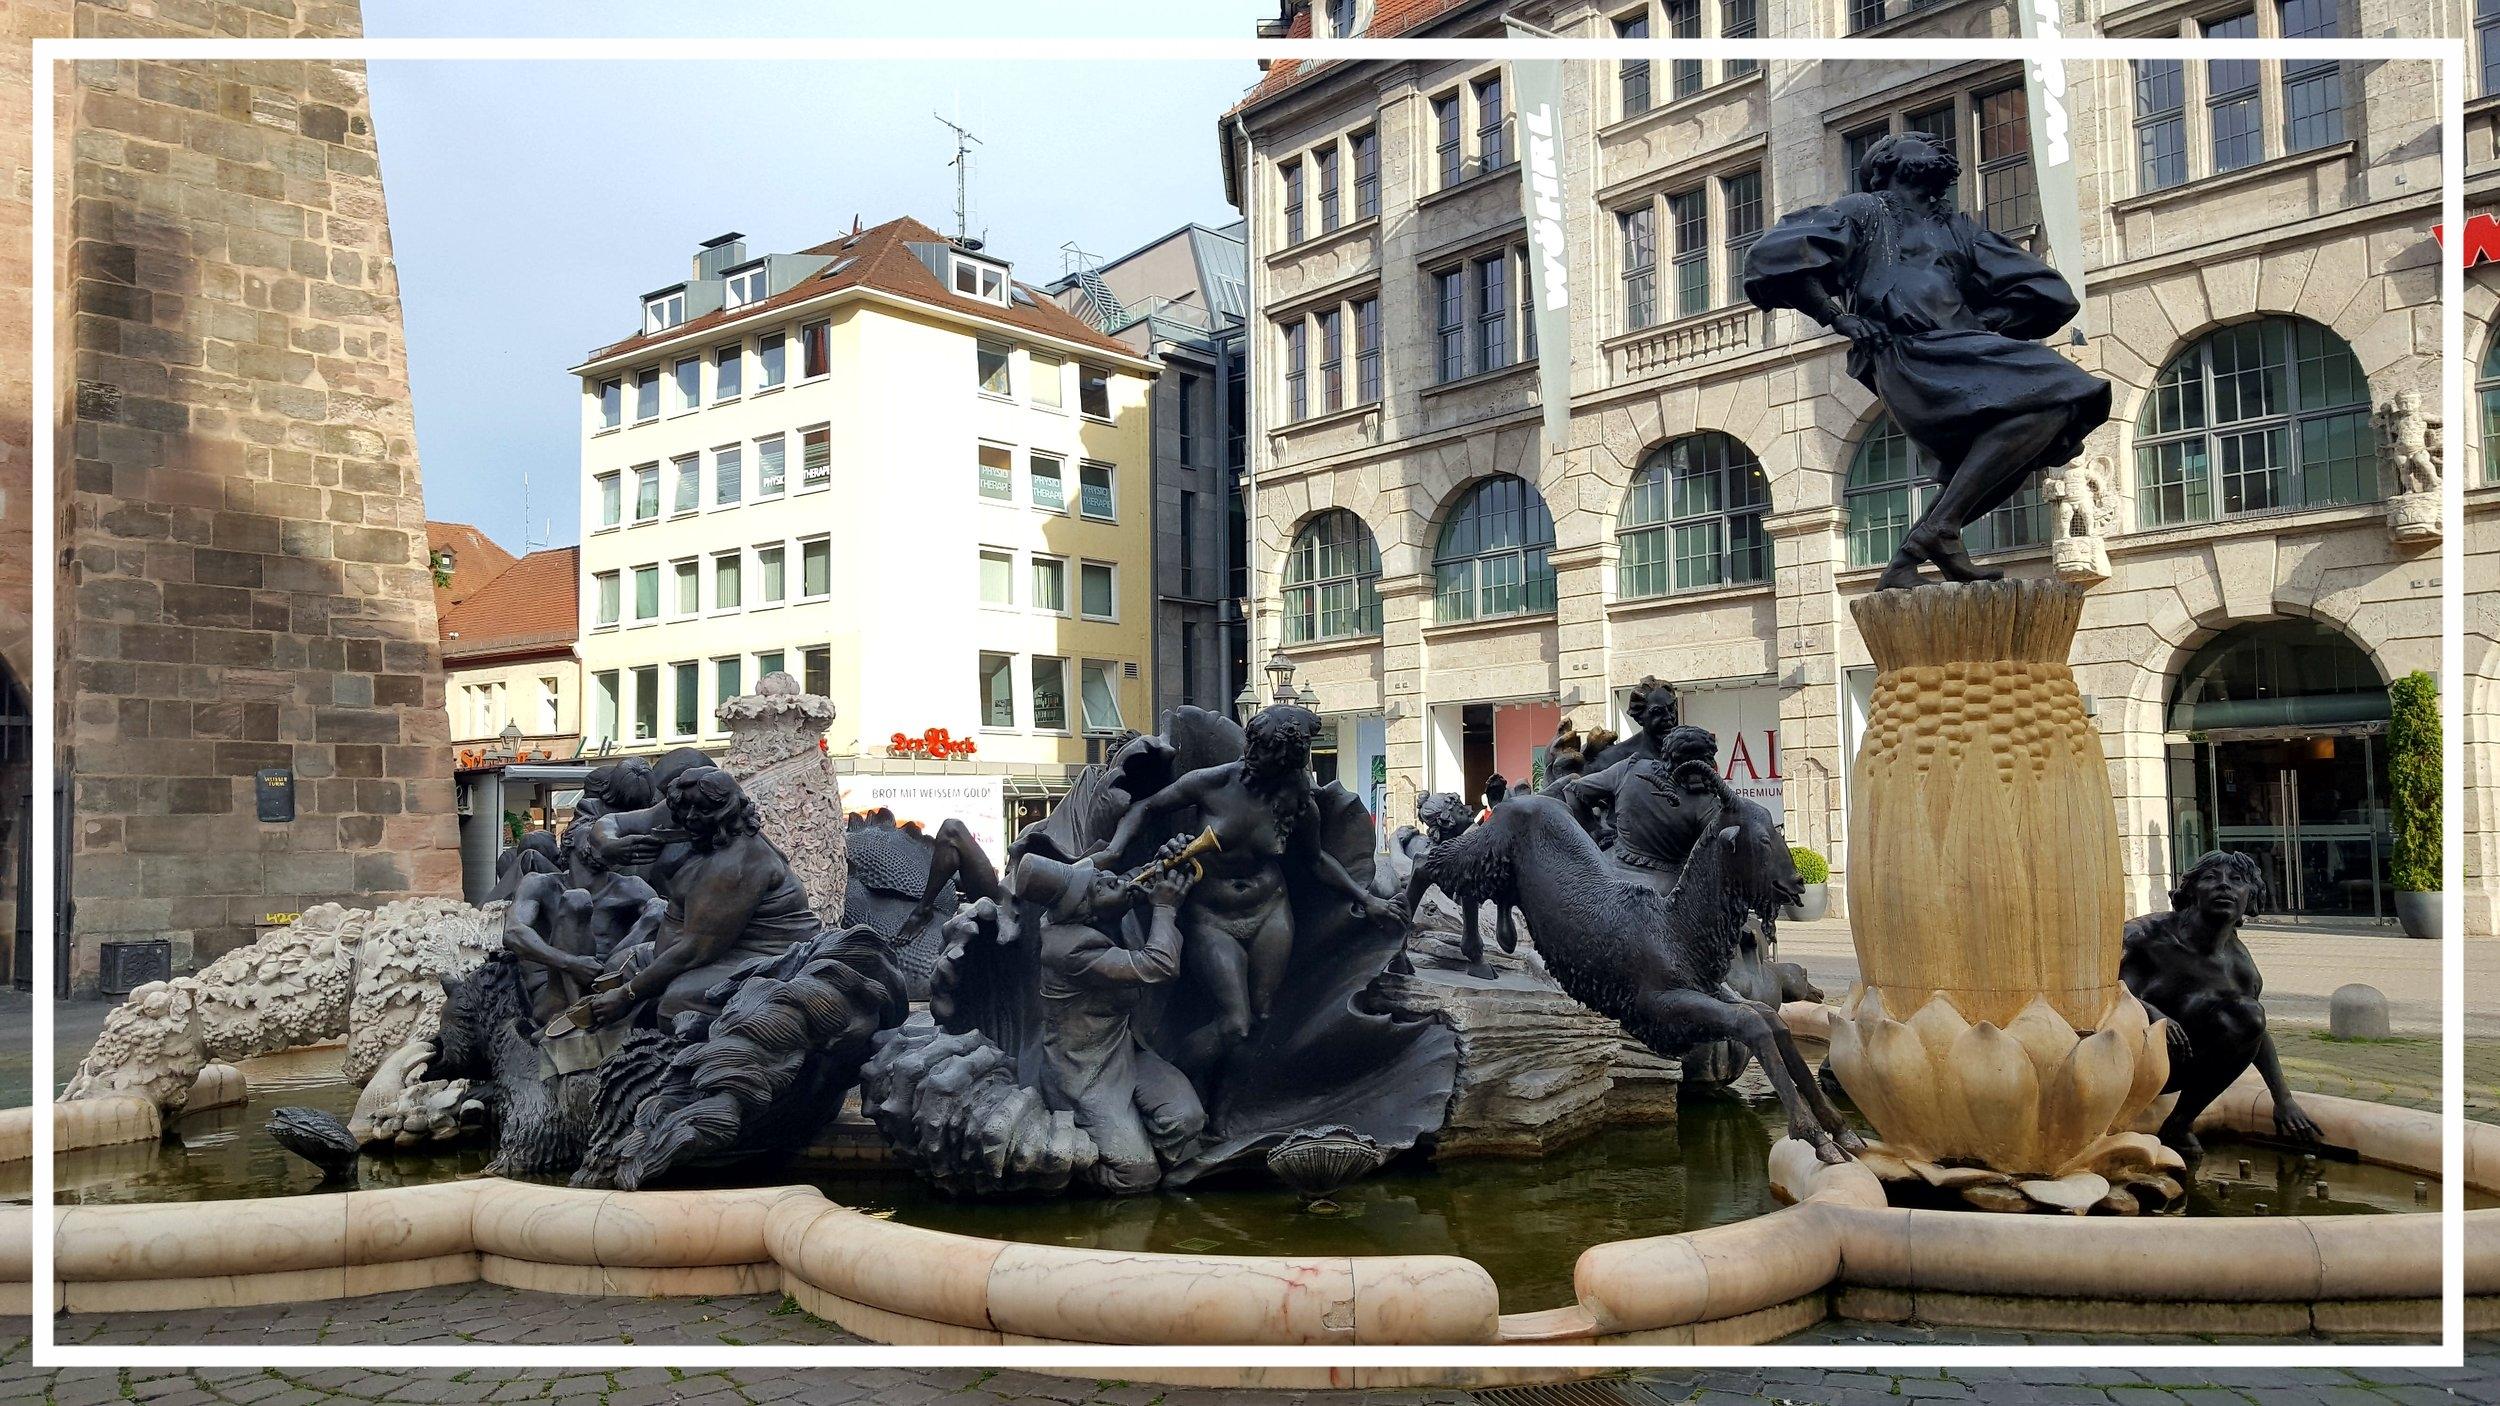 Nuremberg ehekarussell fountain